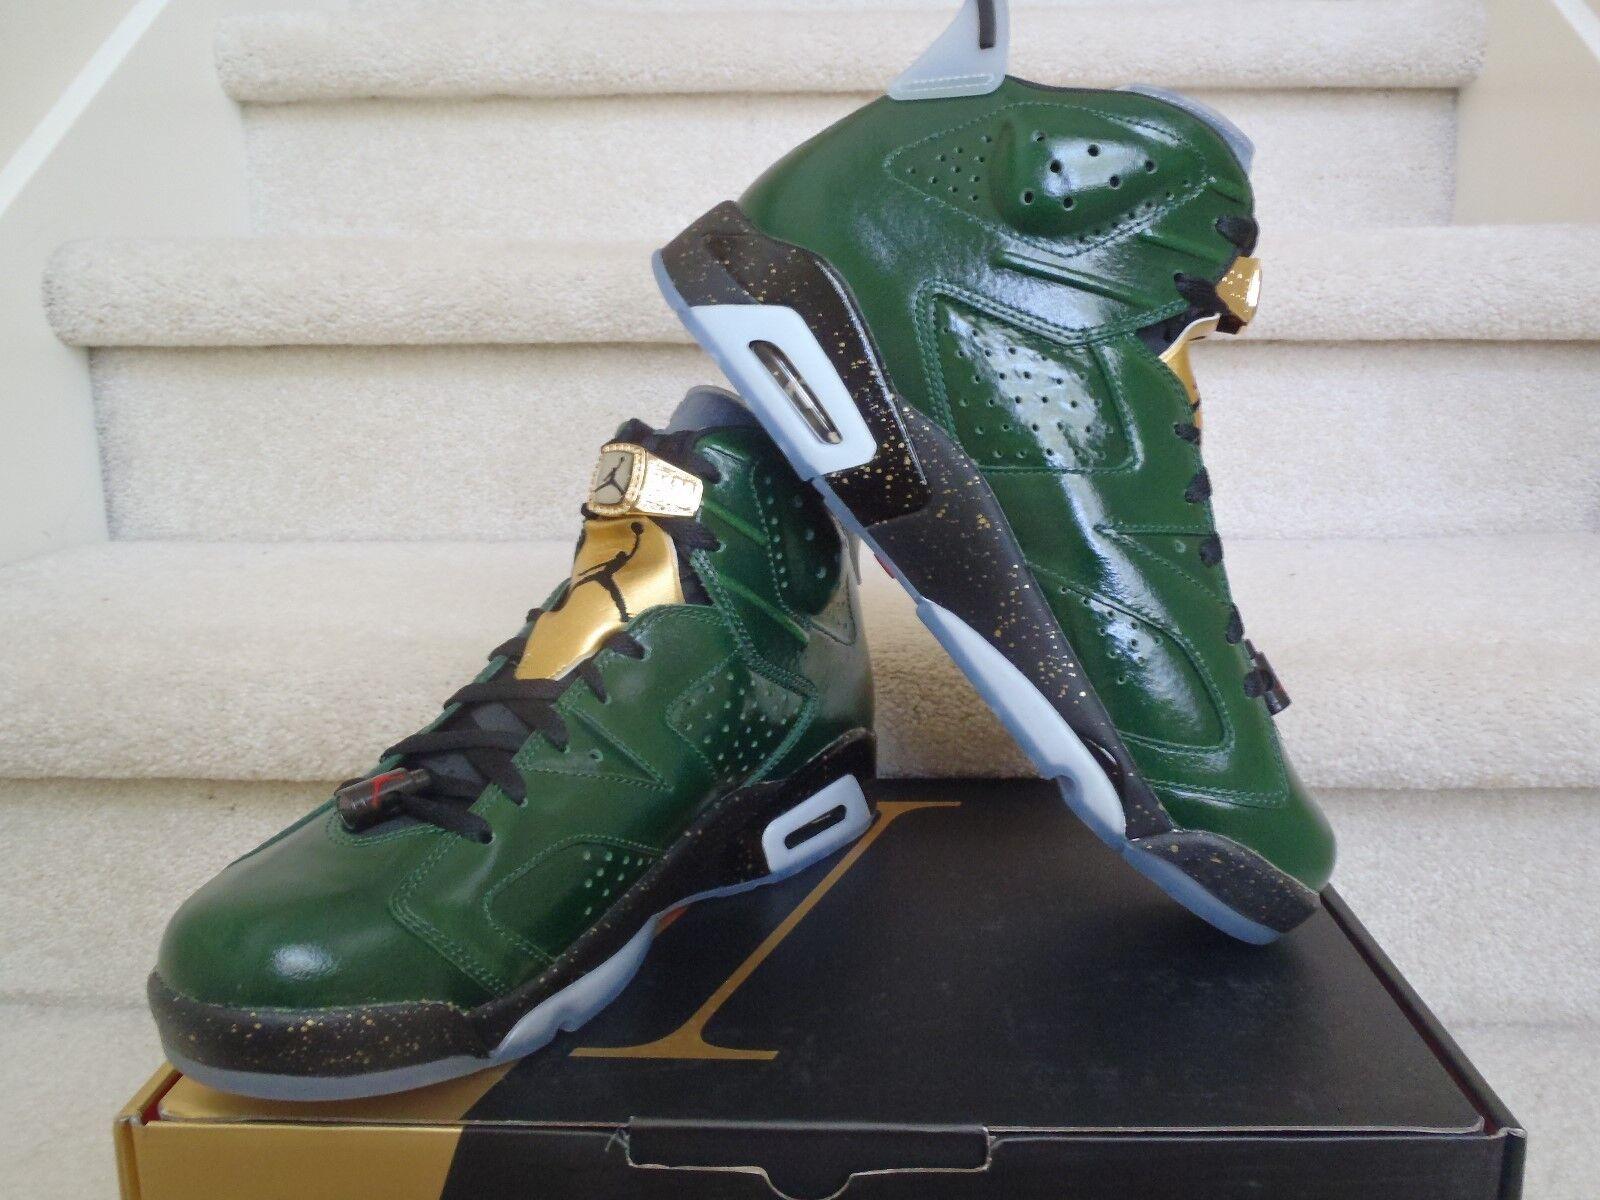 Air Jordan Jordan Jordan 6 VI Retro  Champagne Championship Pack Size10 DS 220912